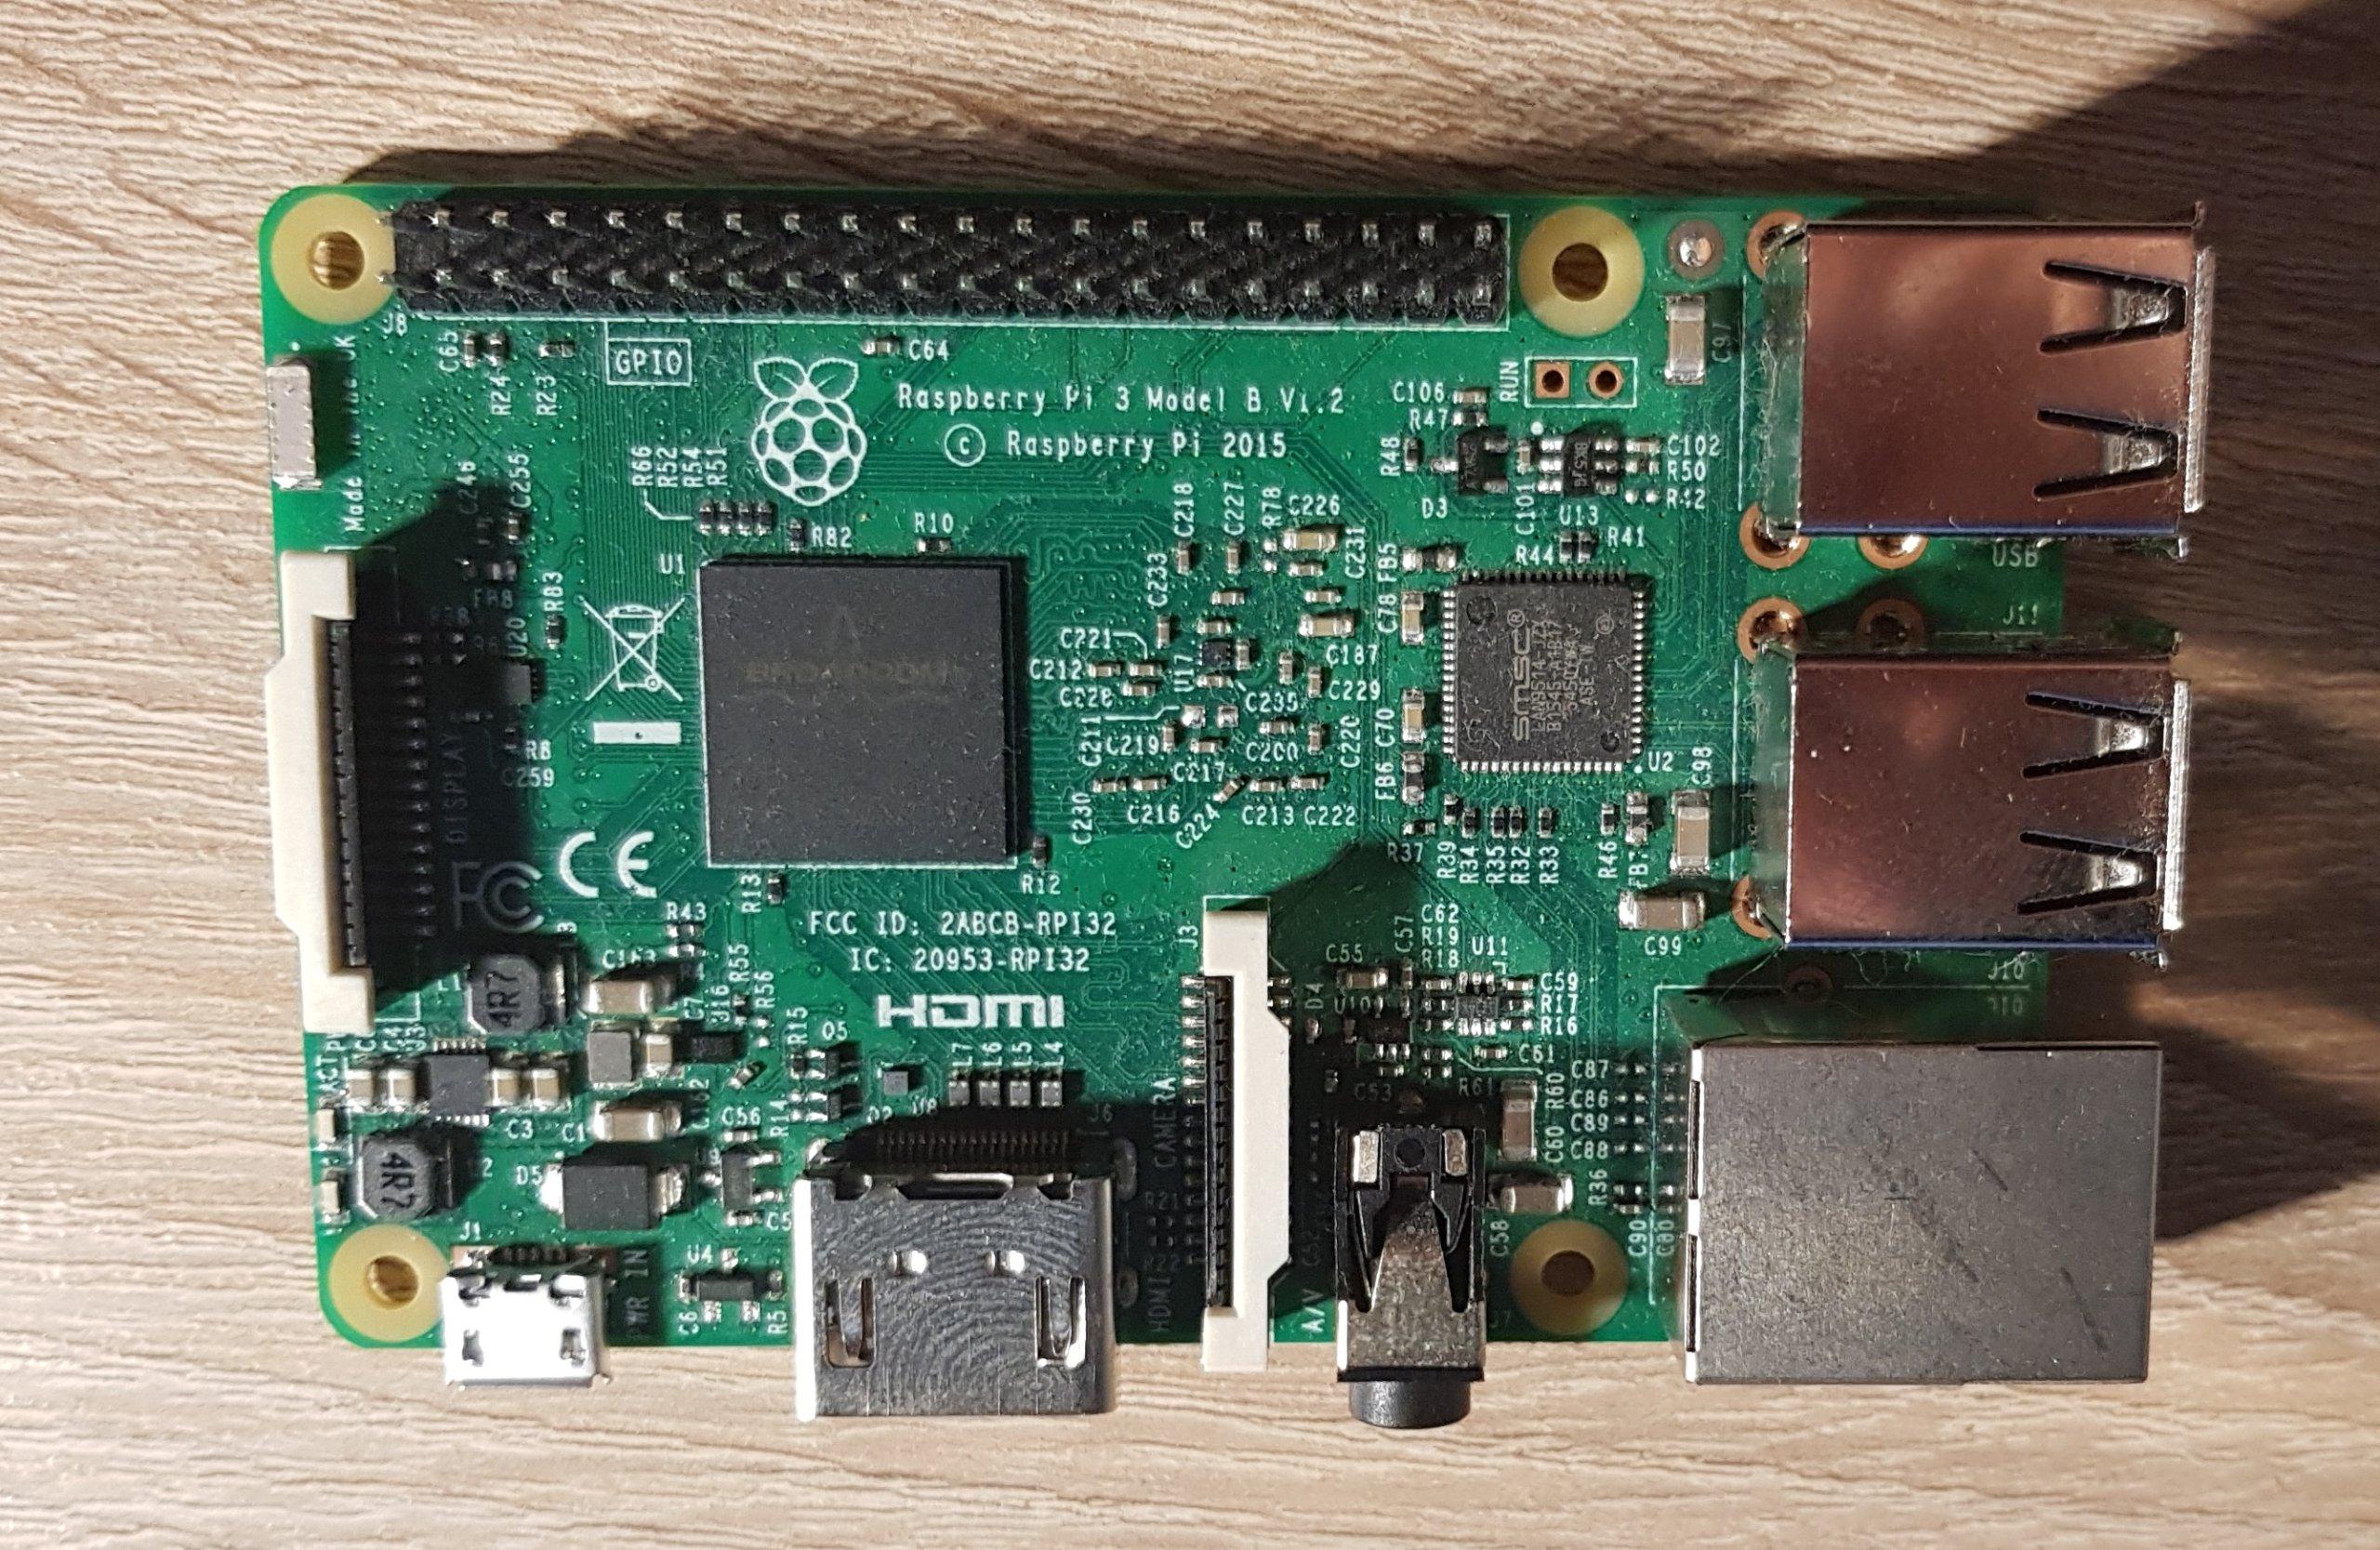 Raspberry Pi 3 + raspberry pi 1 + nowa obudowa +SD